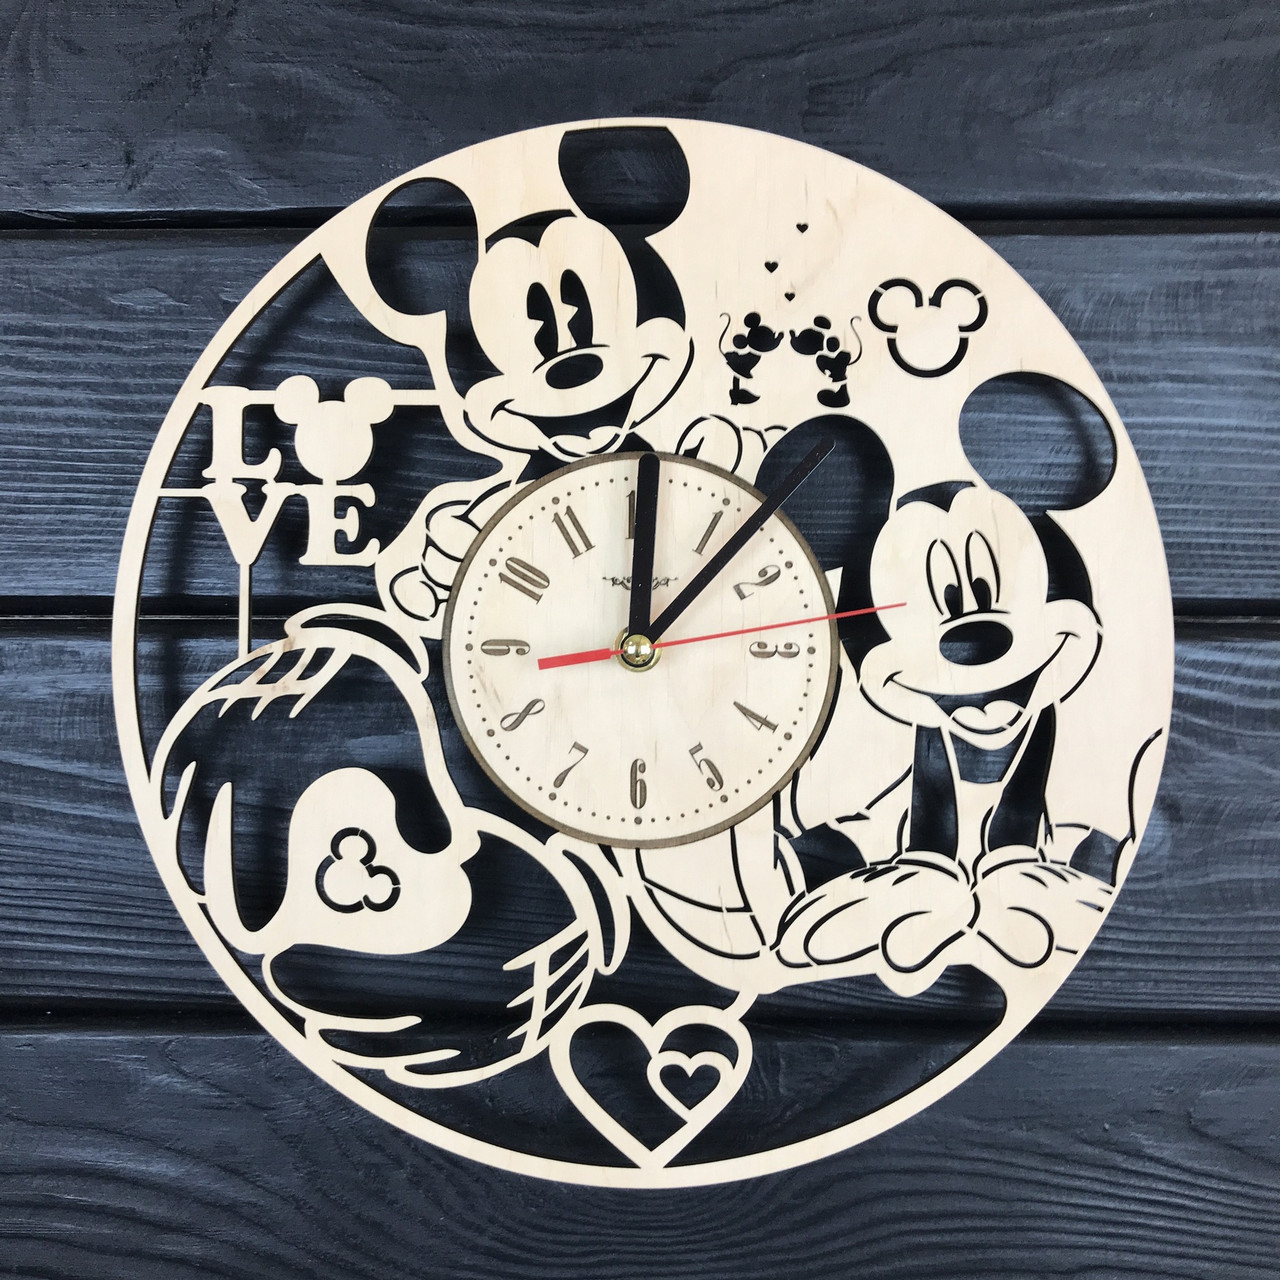 Детские часы на стену «Микки Маус»